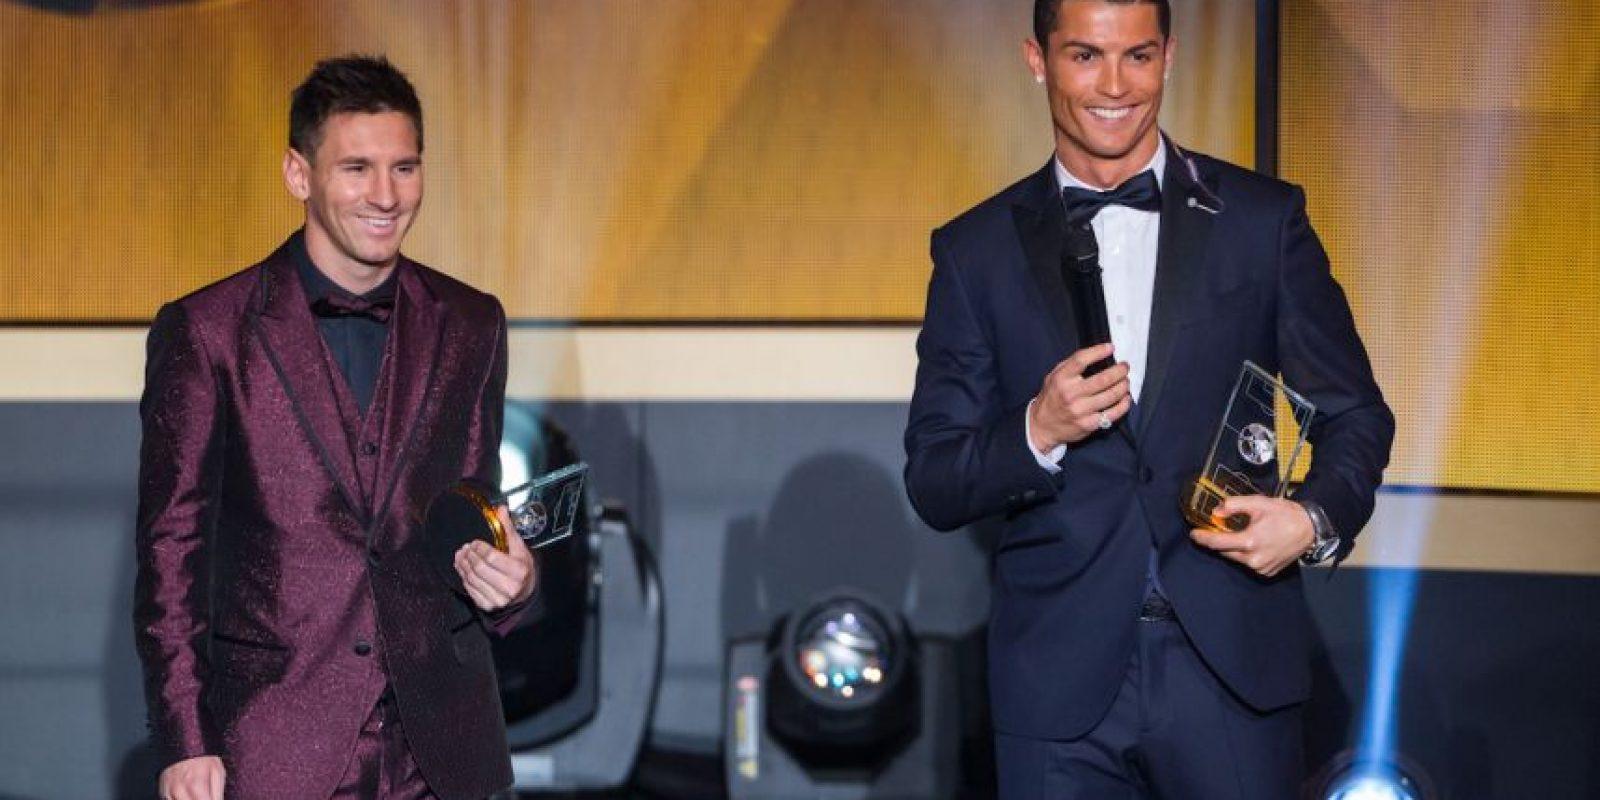 2. E incluso, tuvo un gran gesto con él Foto:Getty Images